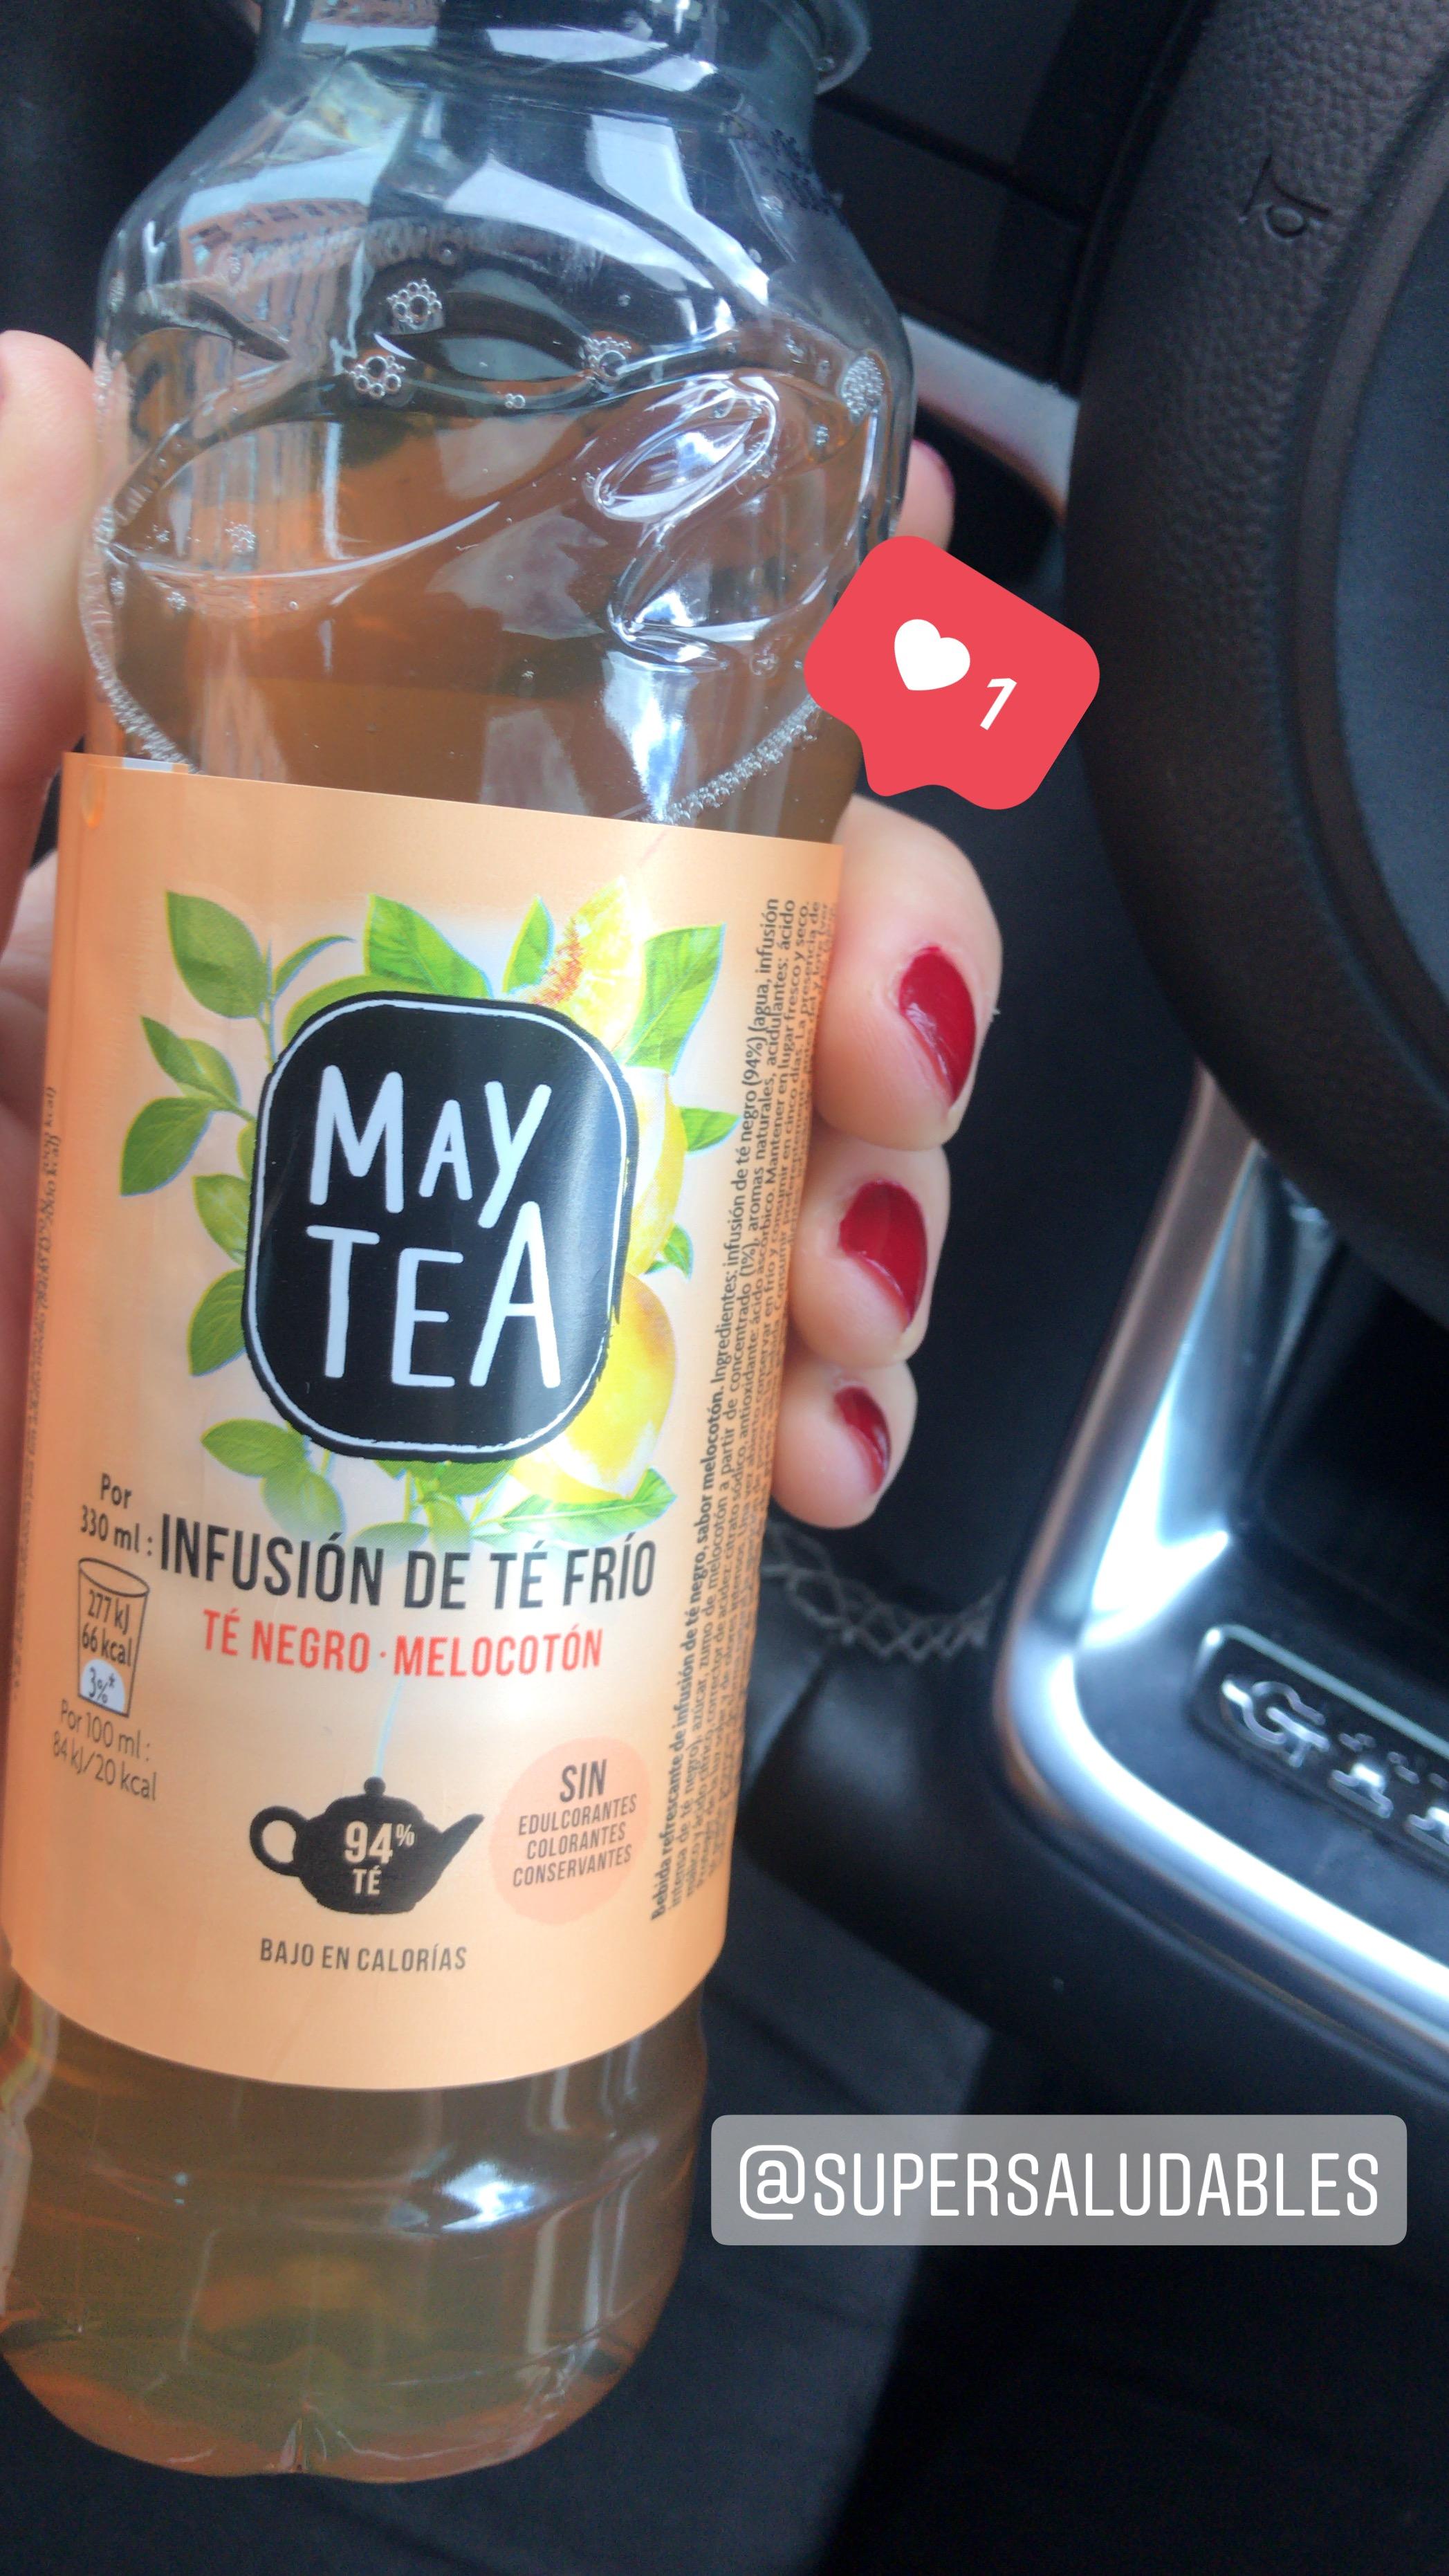 may tea té negro